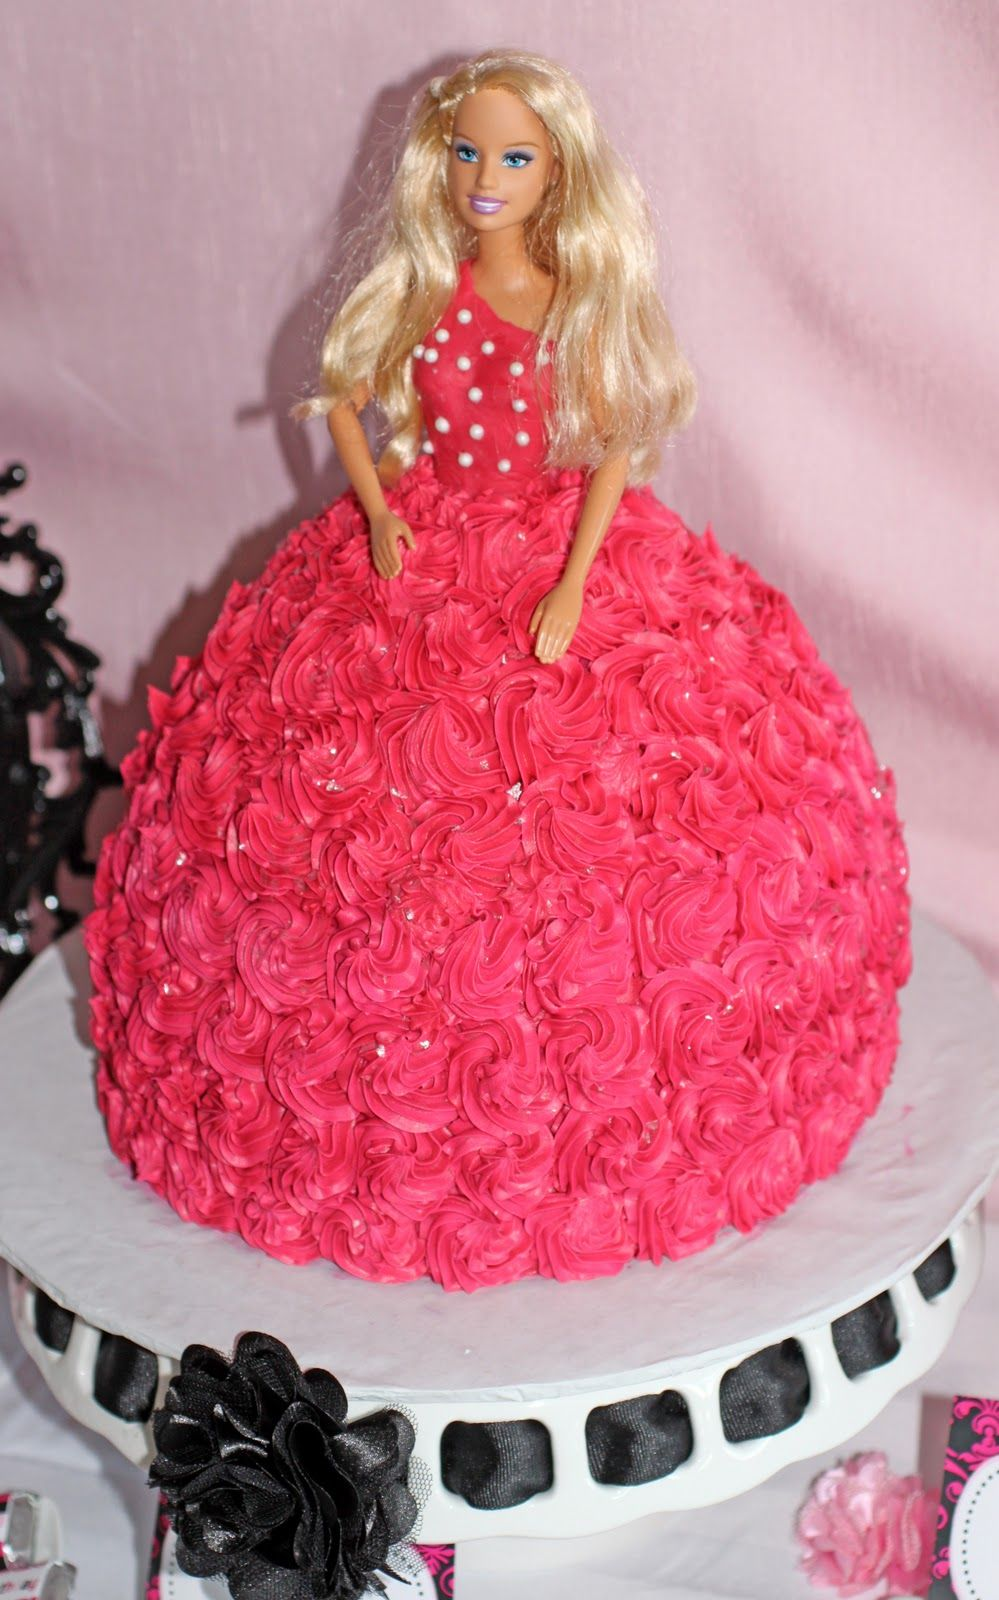 Cake Barbie: recipe